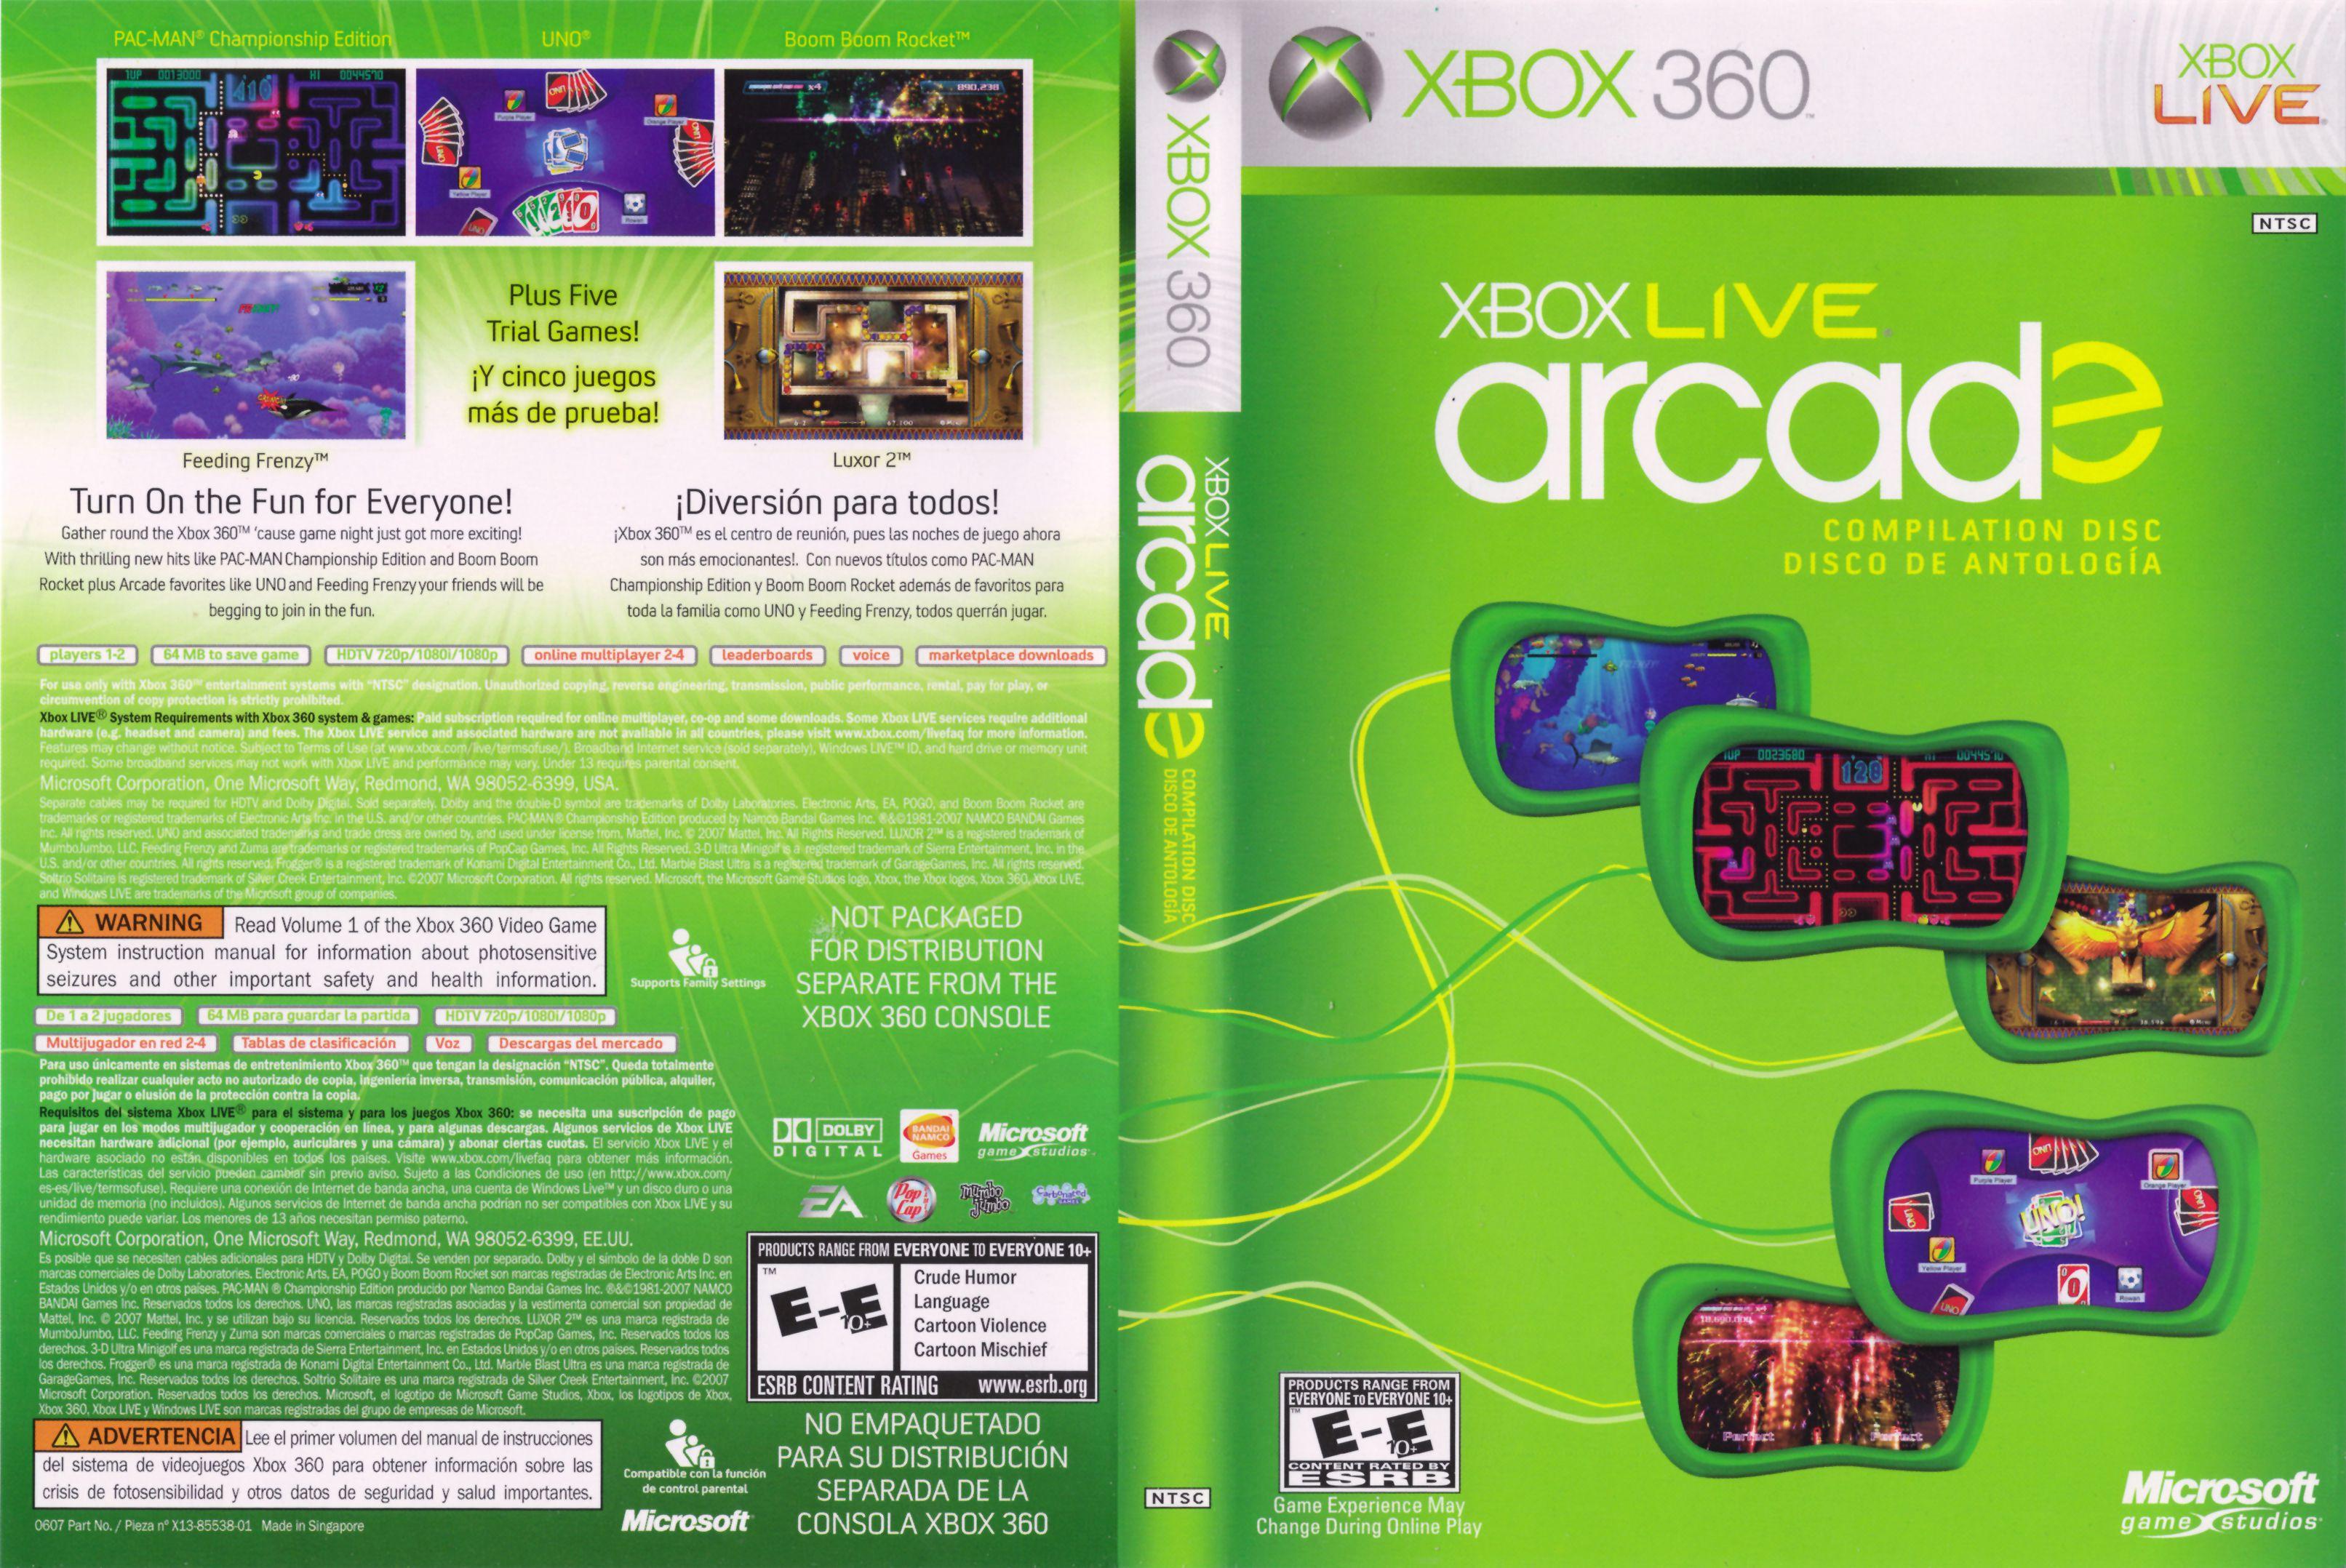 Xbox Live Arcade Fun Games Movie By Genre